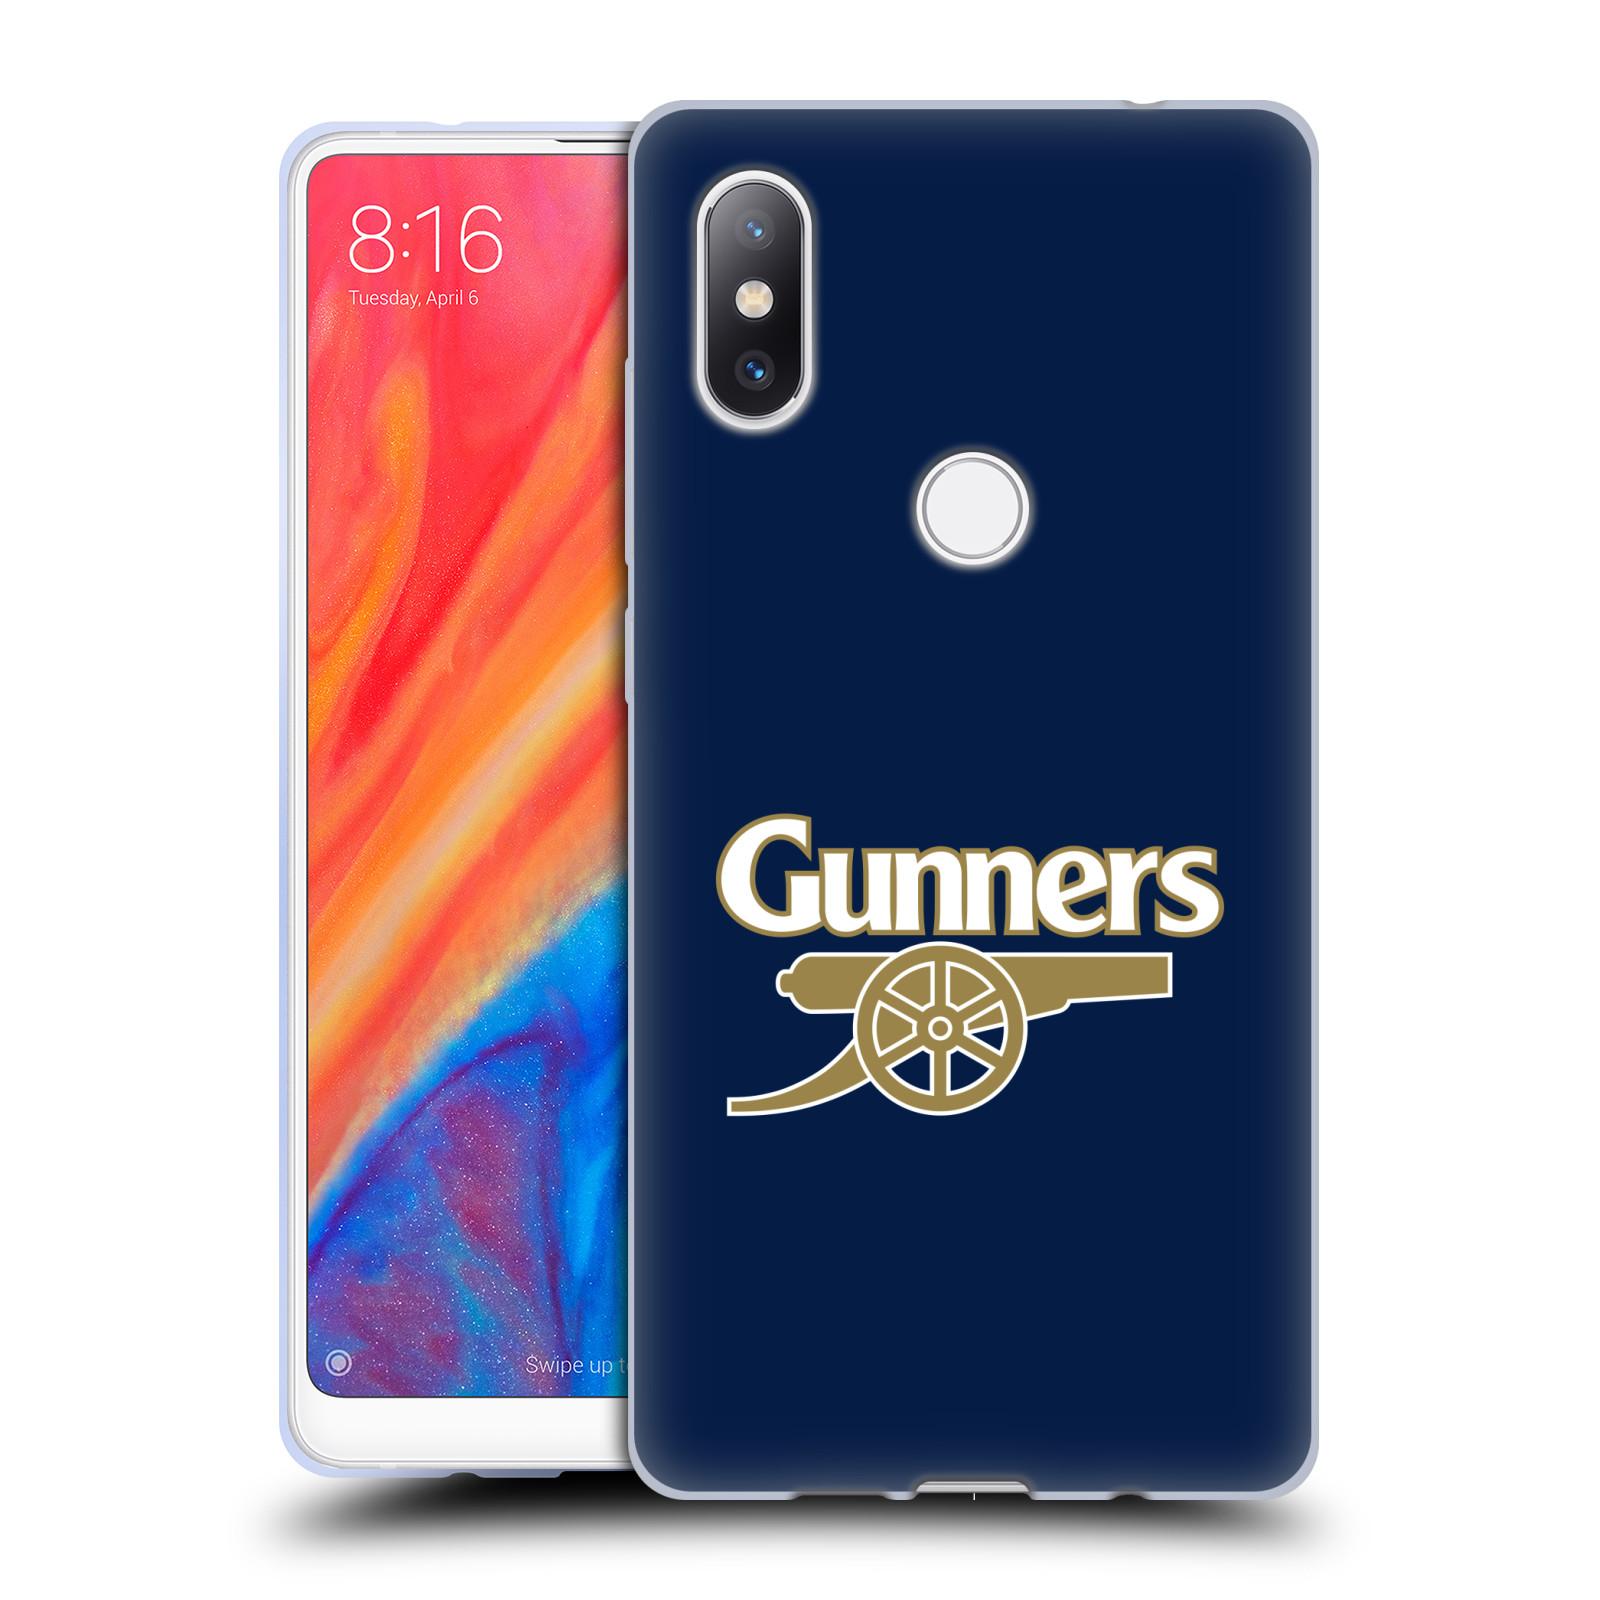 Silikonové pouzdro na mobil Xiaomi Mi Mix 2S - Head Case - Arsenal FC - Gunners